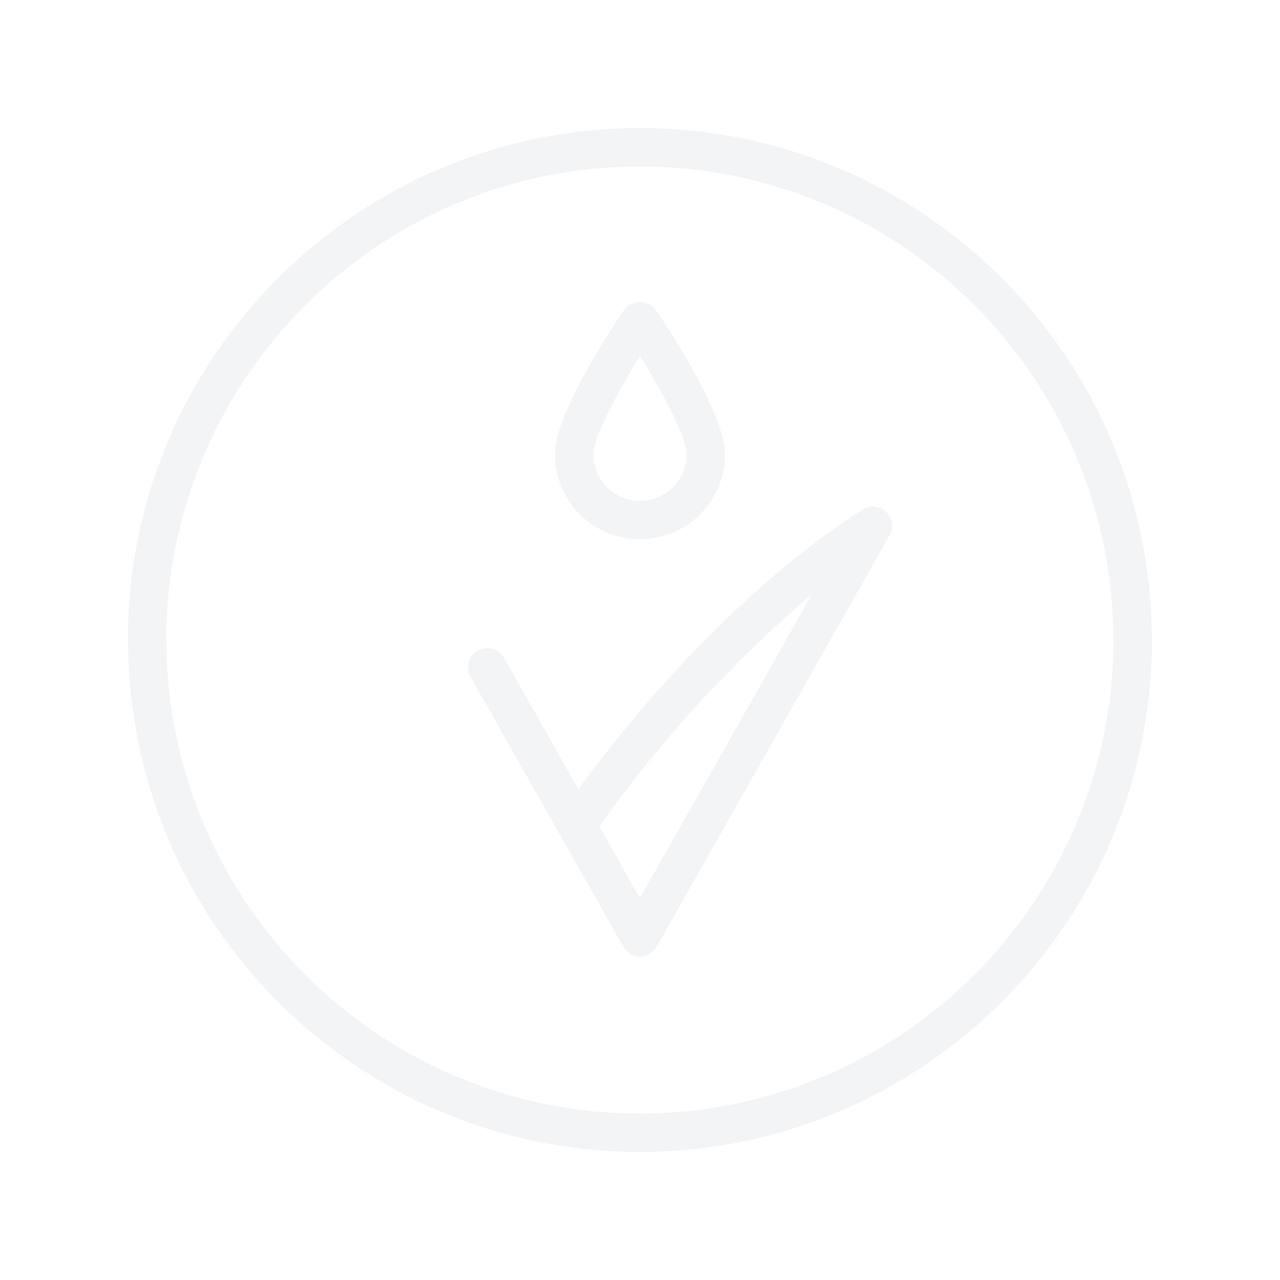 L'Oreal True Match Powder No.3.R/3.C Rose Beige 9g